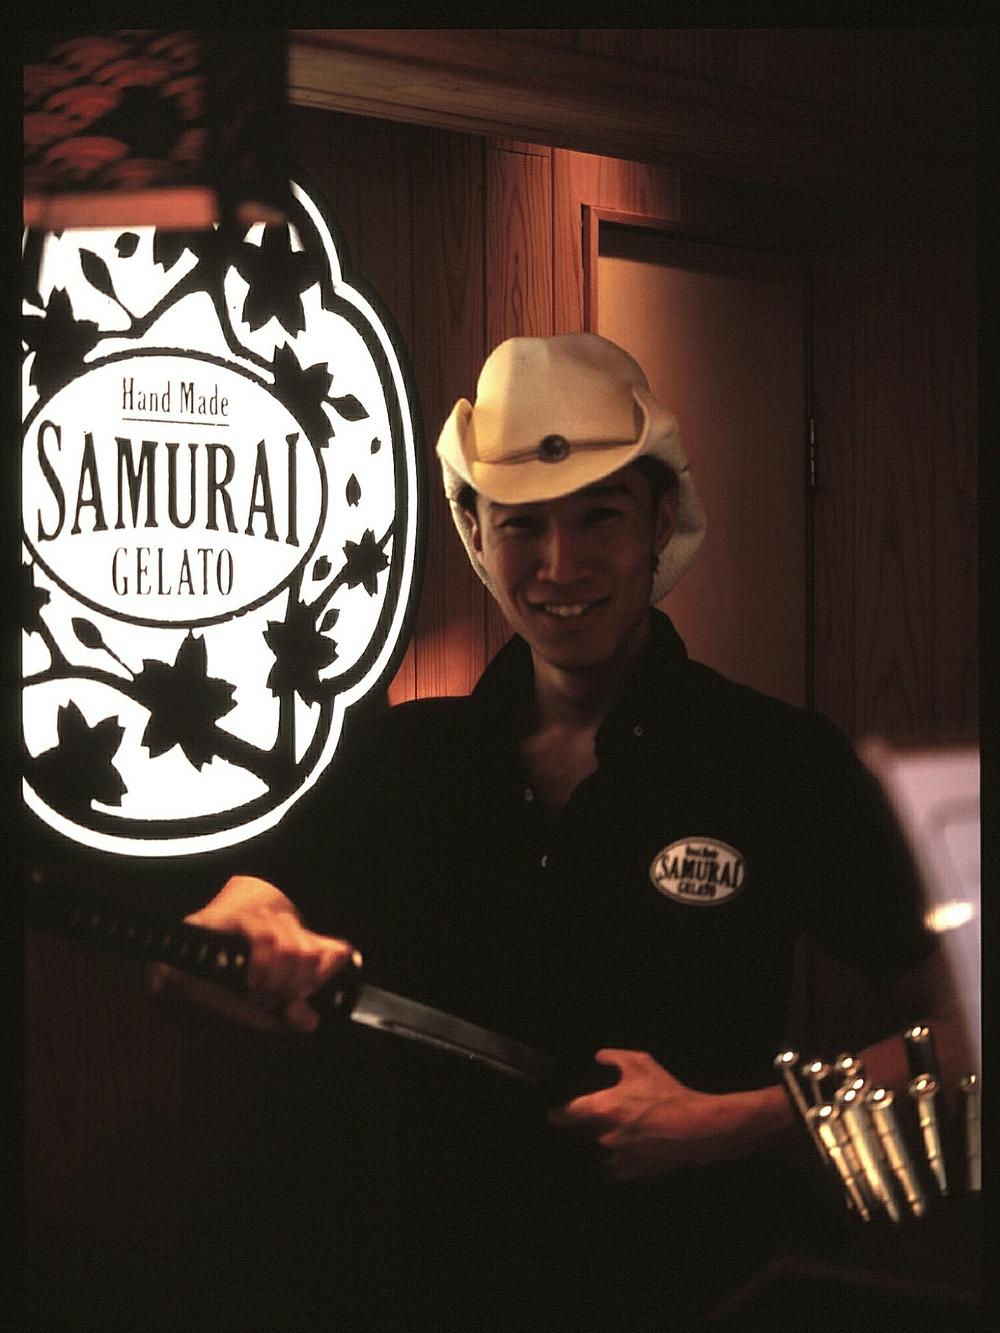 Samurai Gelato ice cream shop, Tenjin, Fukuoka (Mamiya 645 Velvia 100)